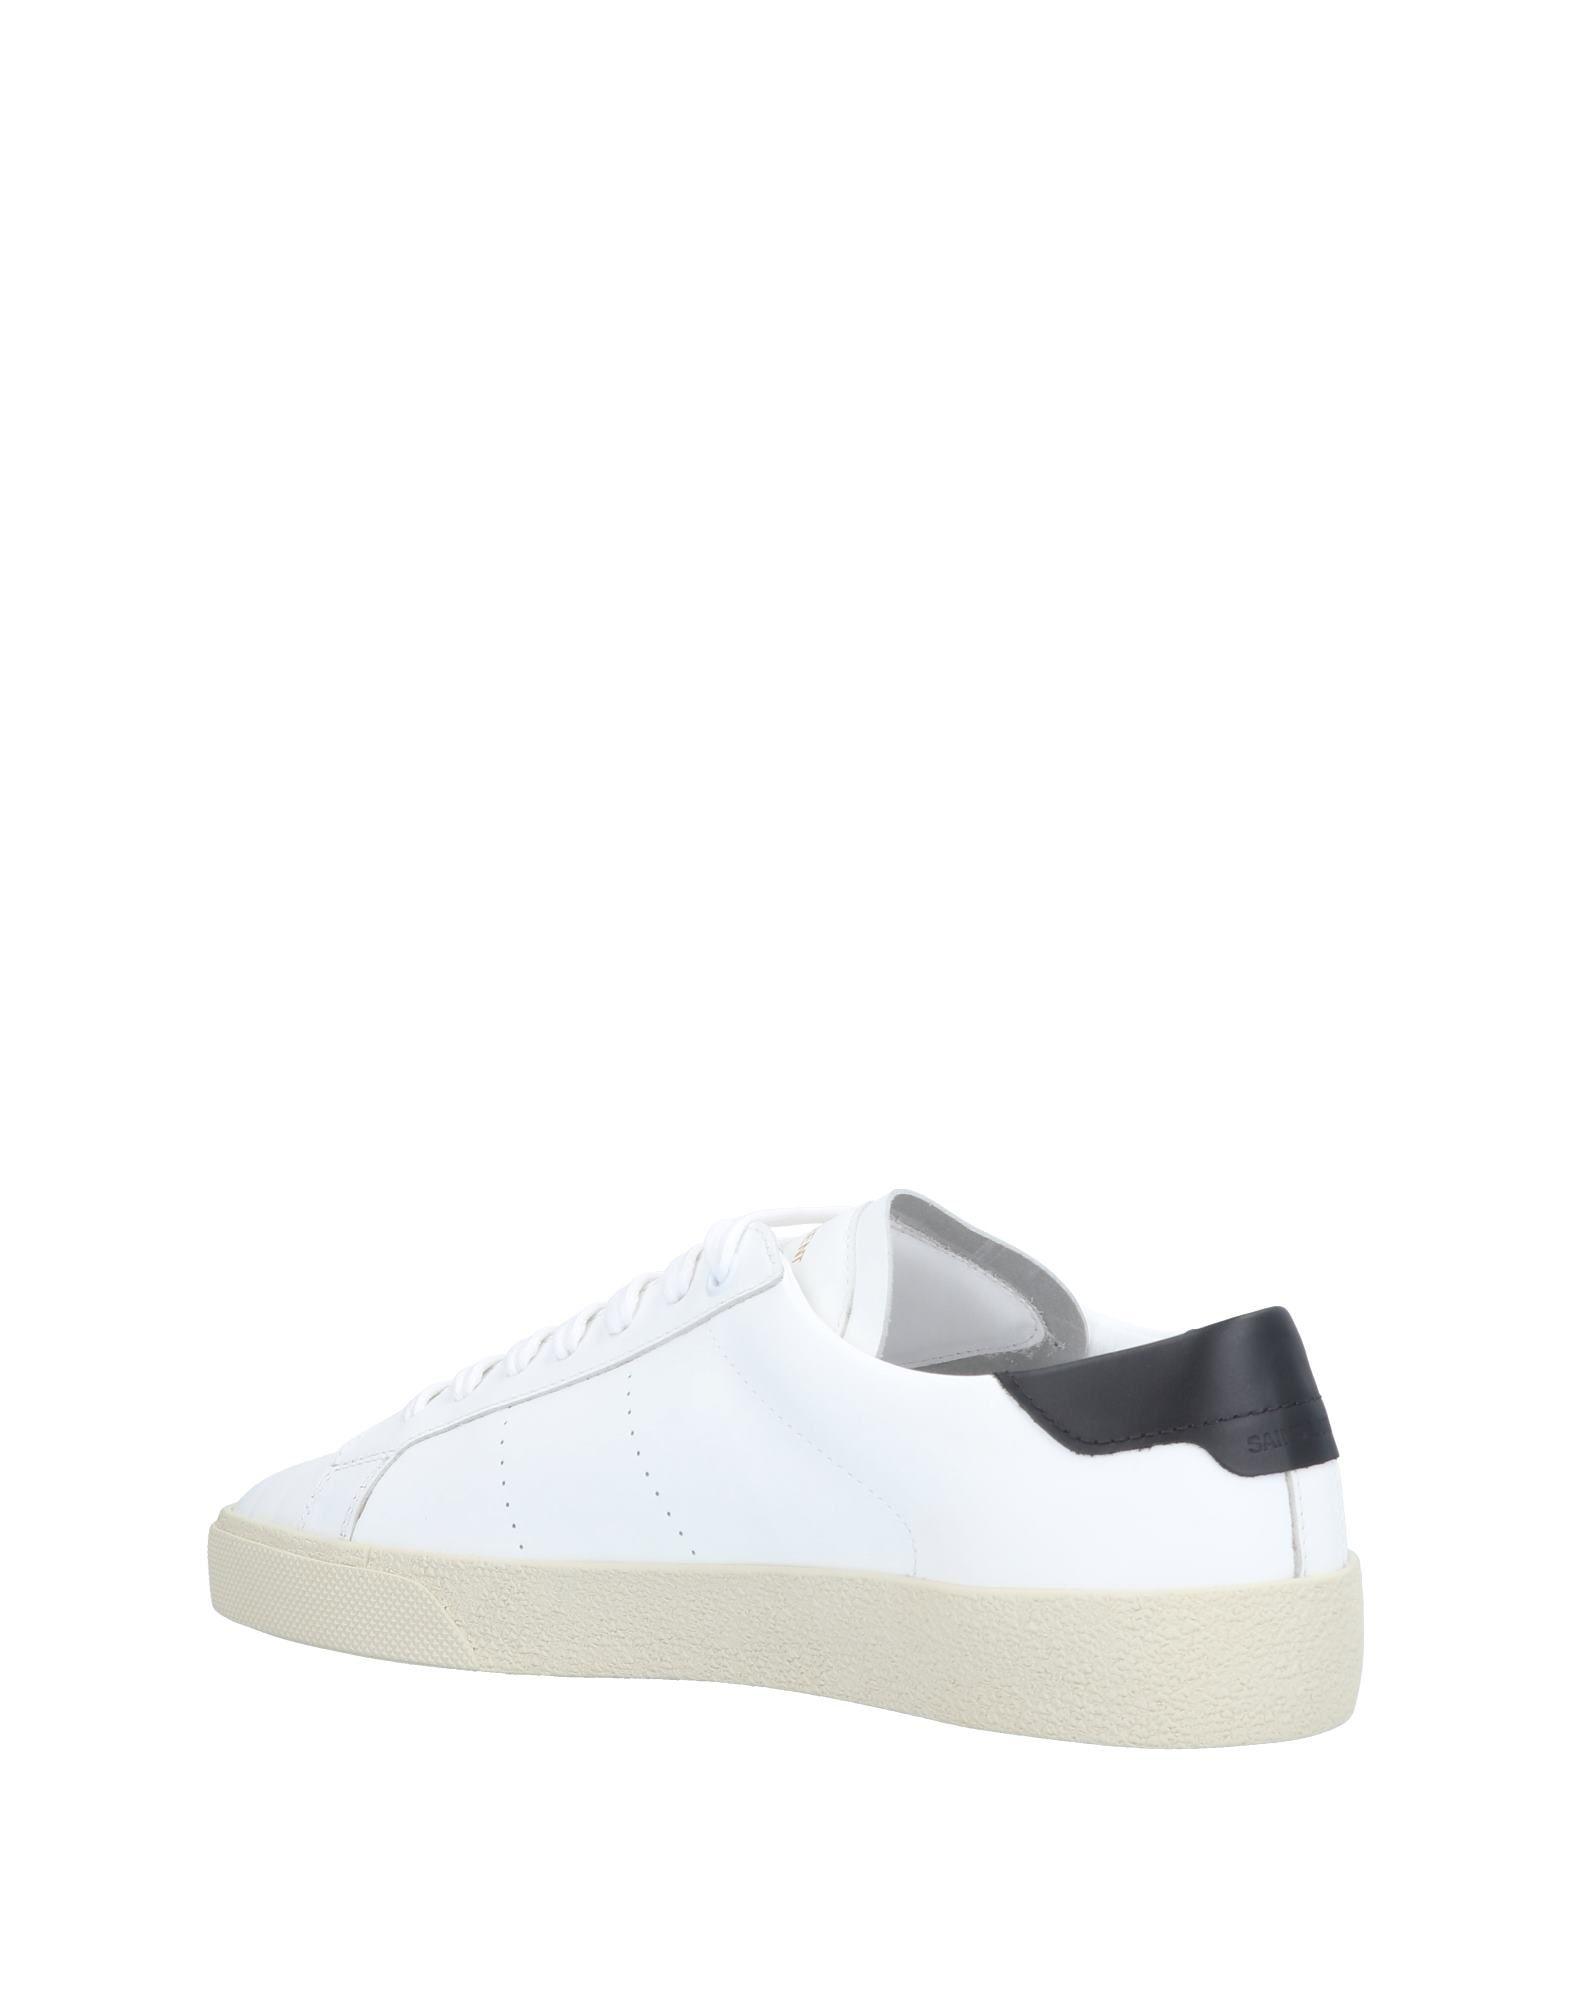 Saint Laurent Sneakers - Men Saint Laurent Sneakers Sneakers Sneakers online on  Australia - 11486294FU 4d4d25